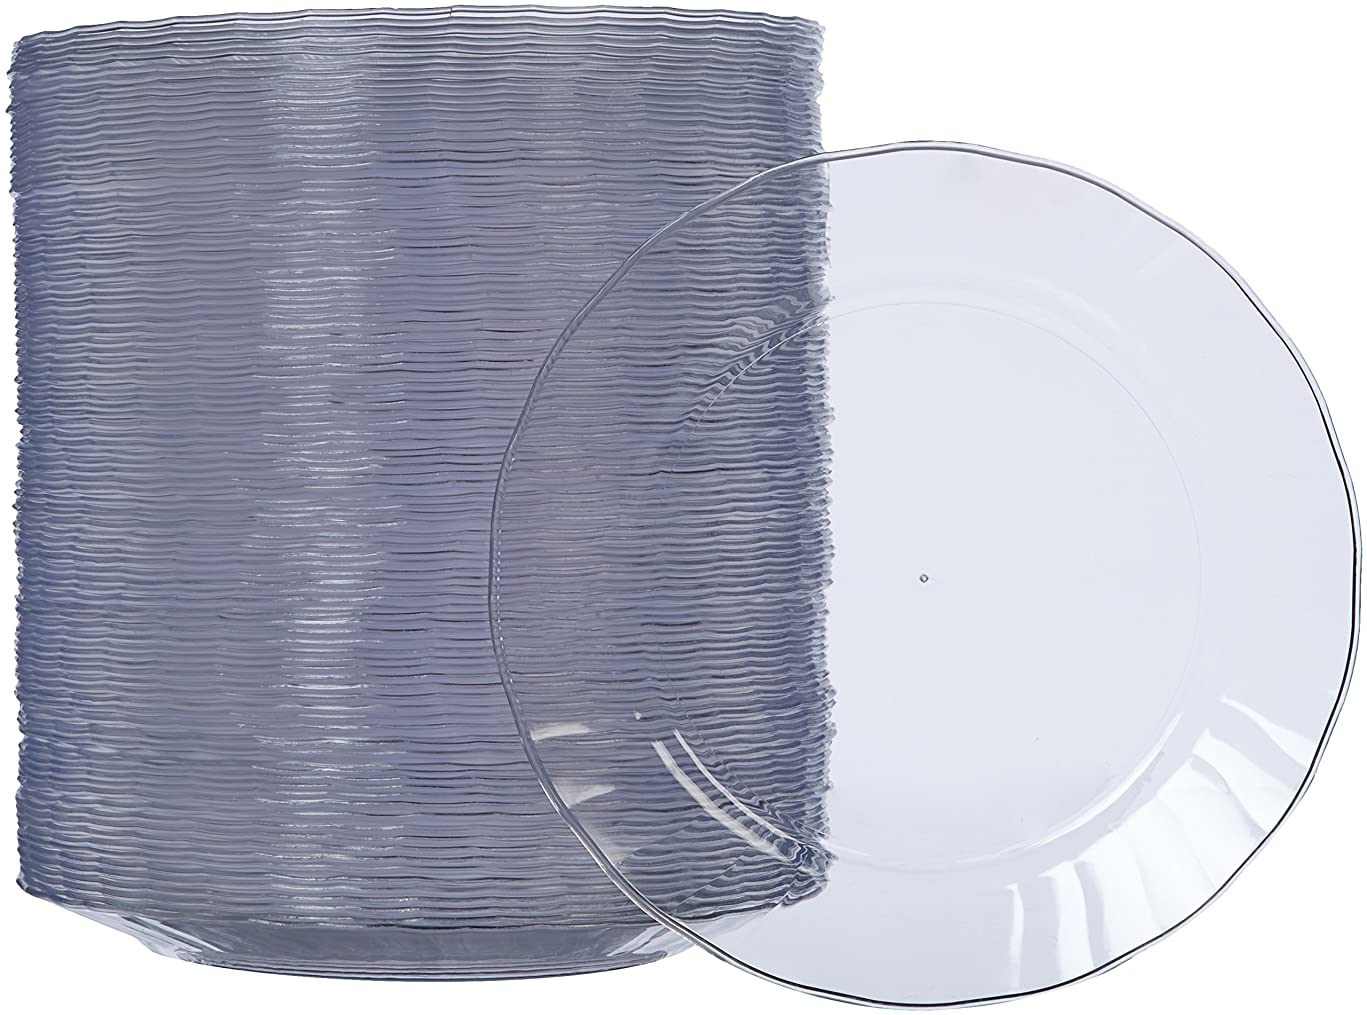 AmazonBasics Disposable Plastic Plates - 100-Pack, 7.5-inch